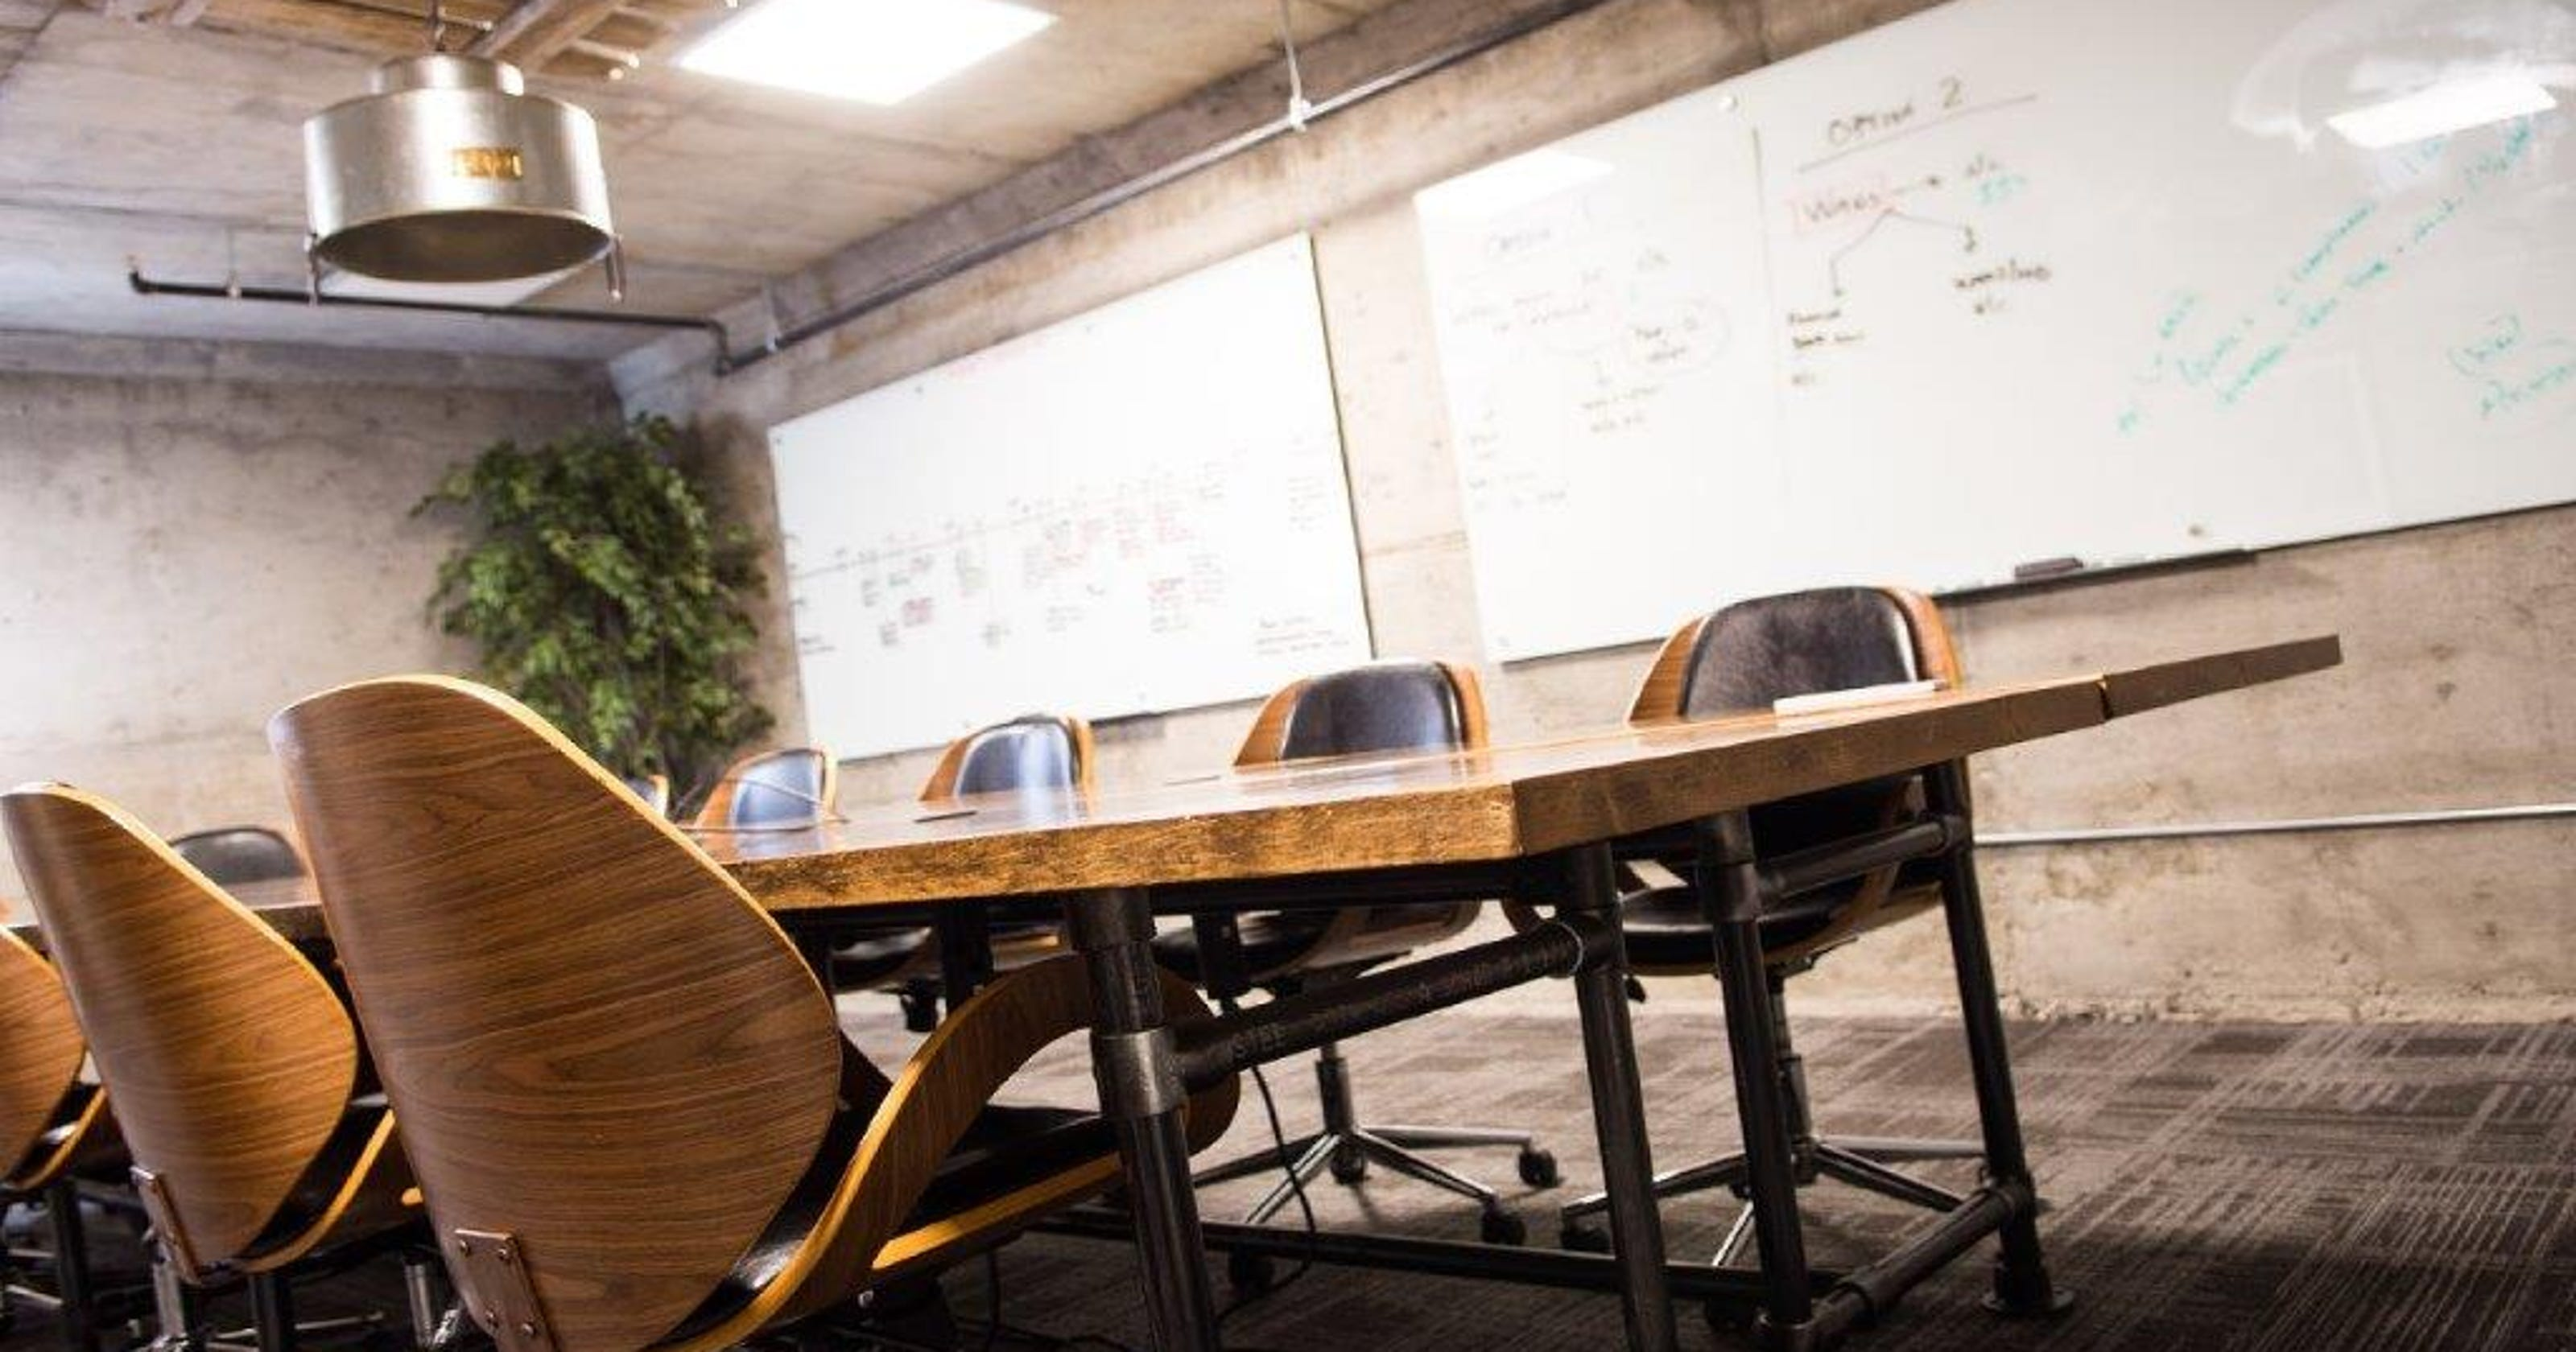 Reno financial tech company files for bankruptcy amid trade